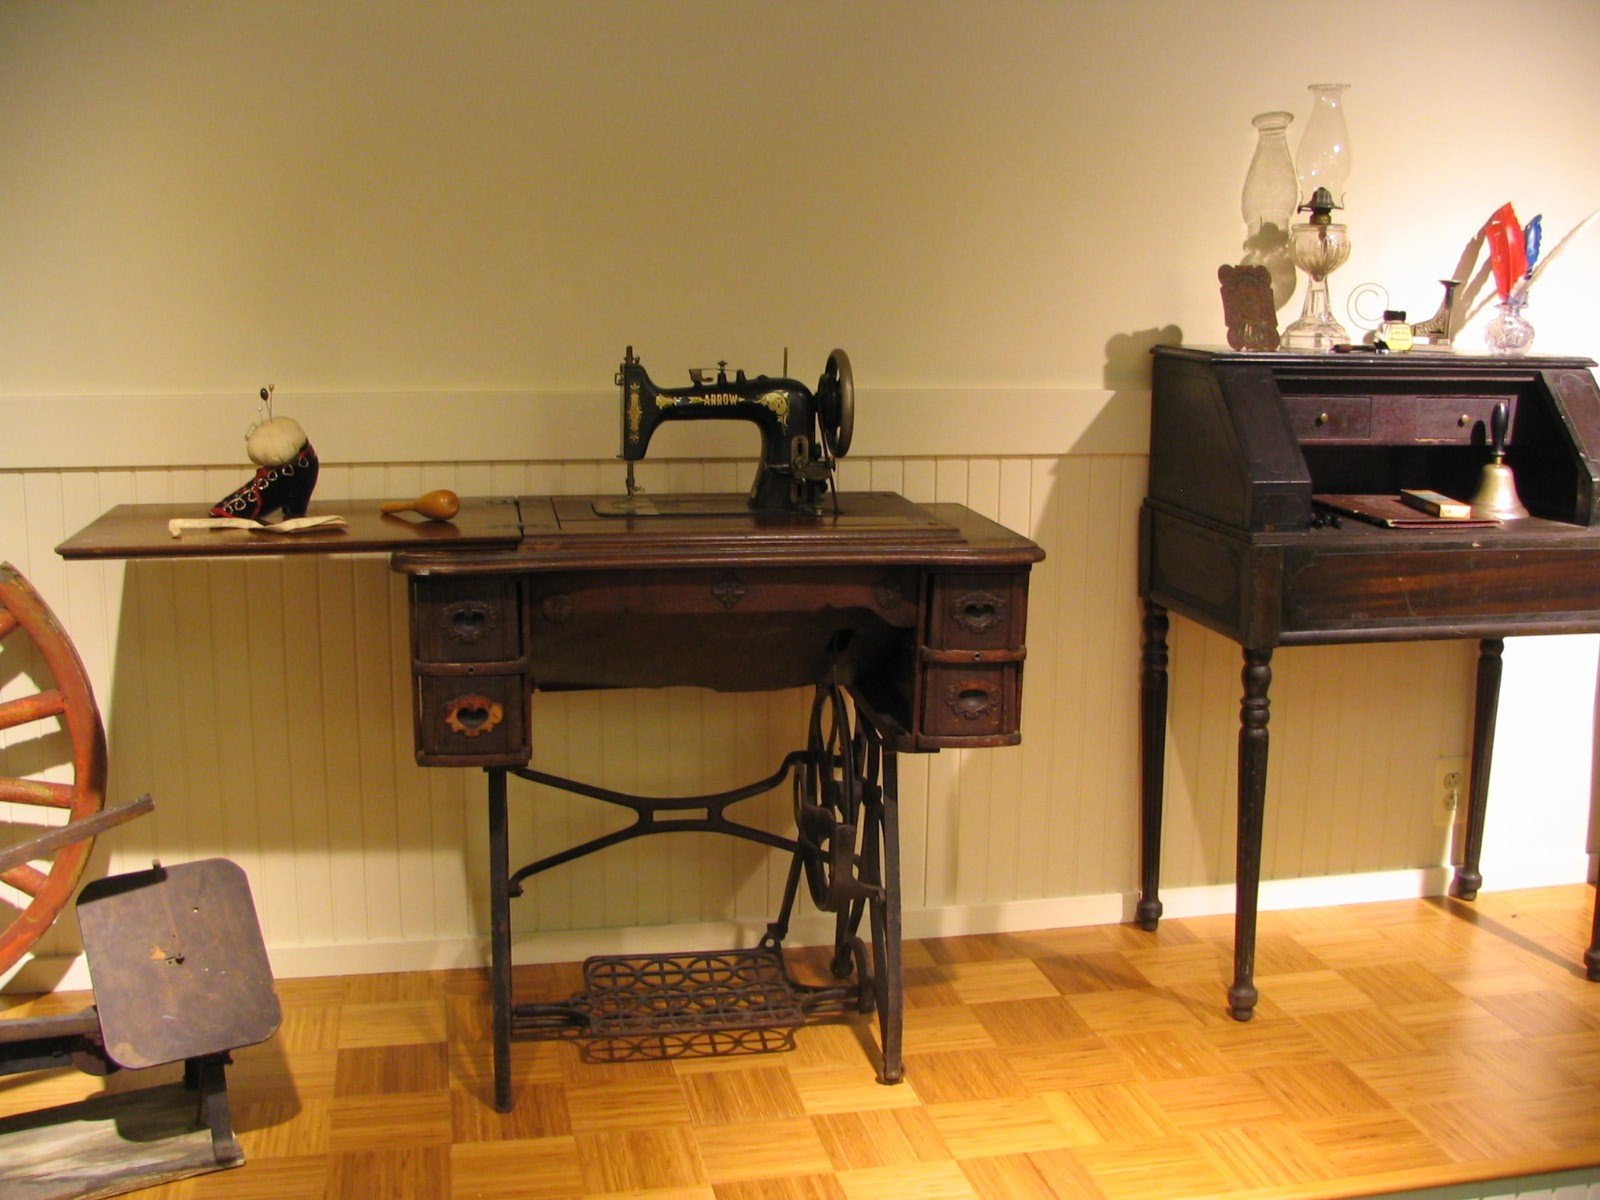 Heritage_Room_Sewing_Machine_and_Desk.jpg